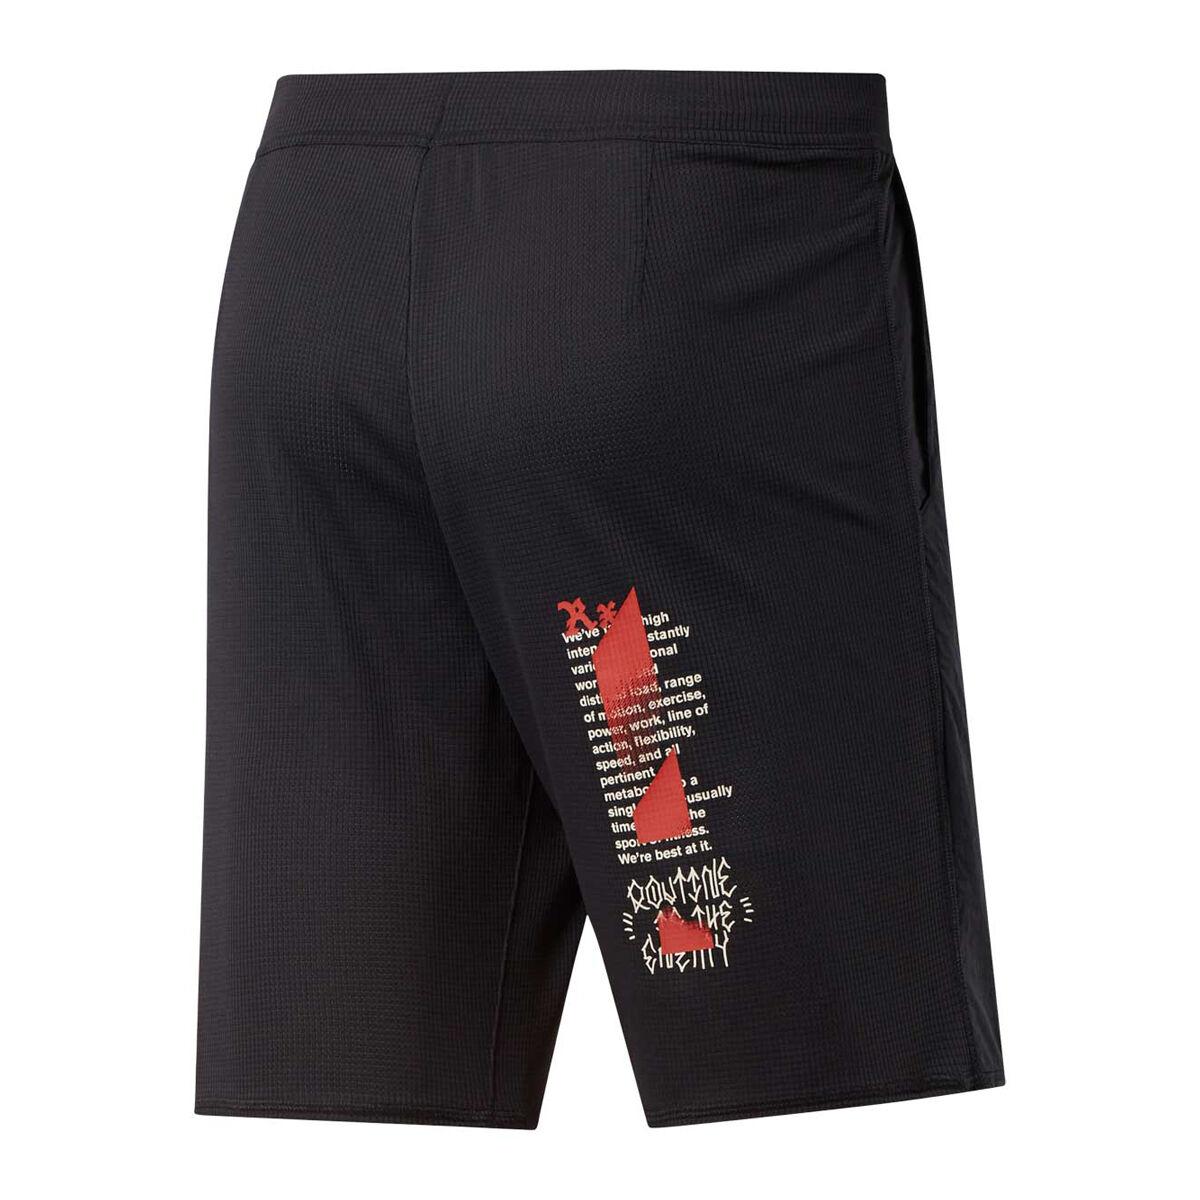 Mens Sport Clothing rebel